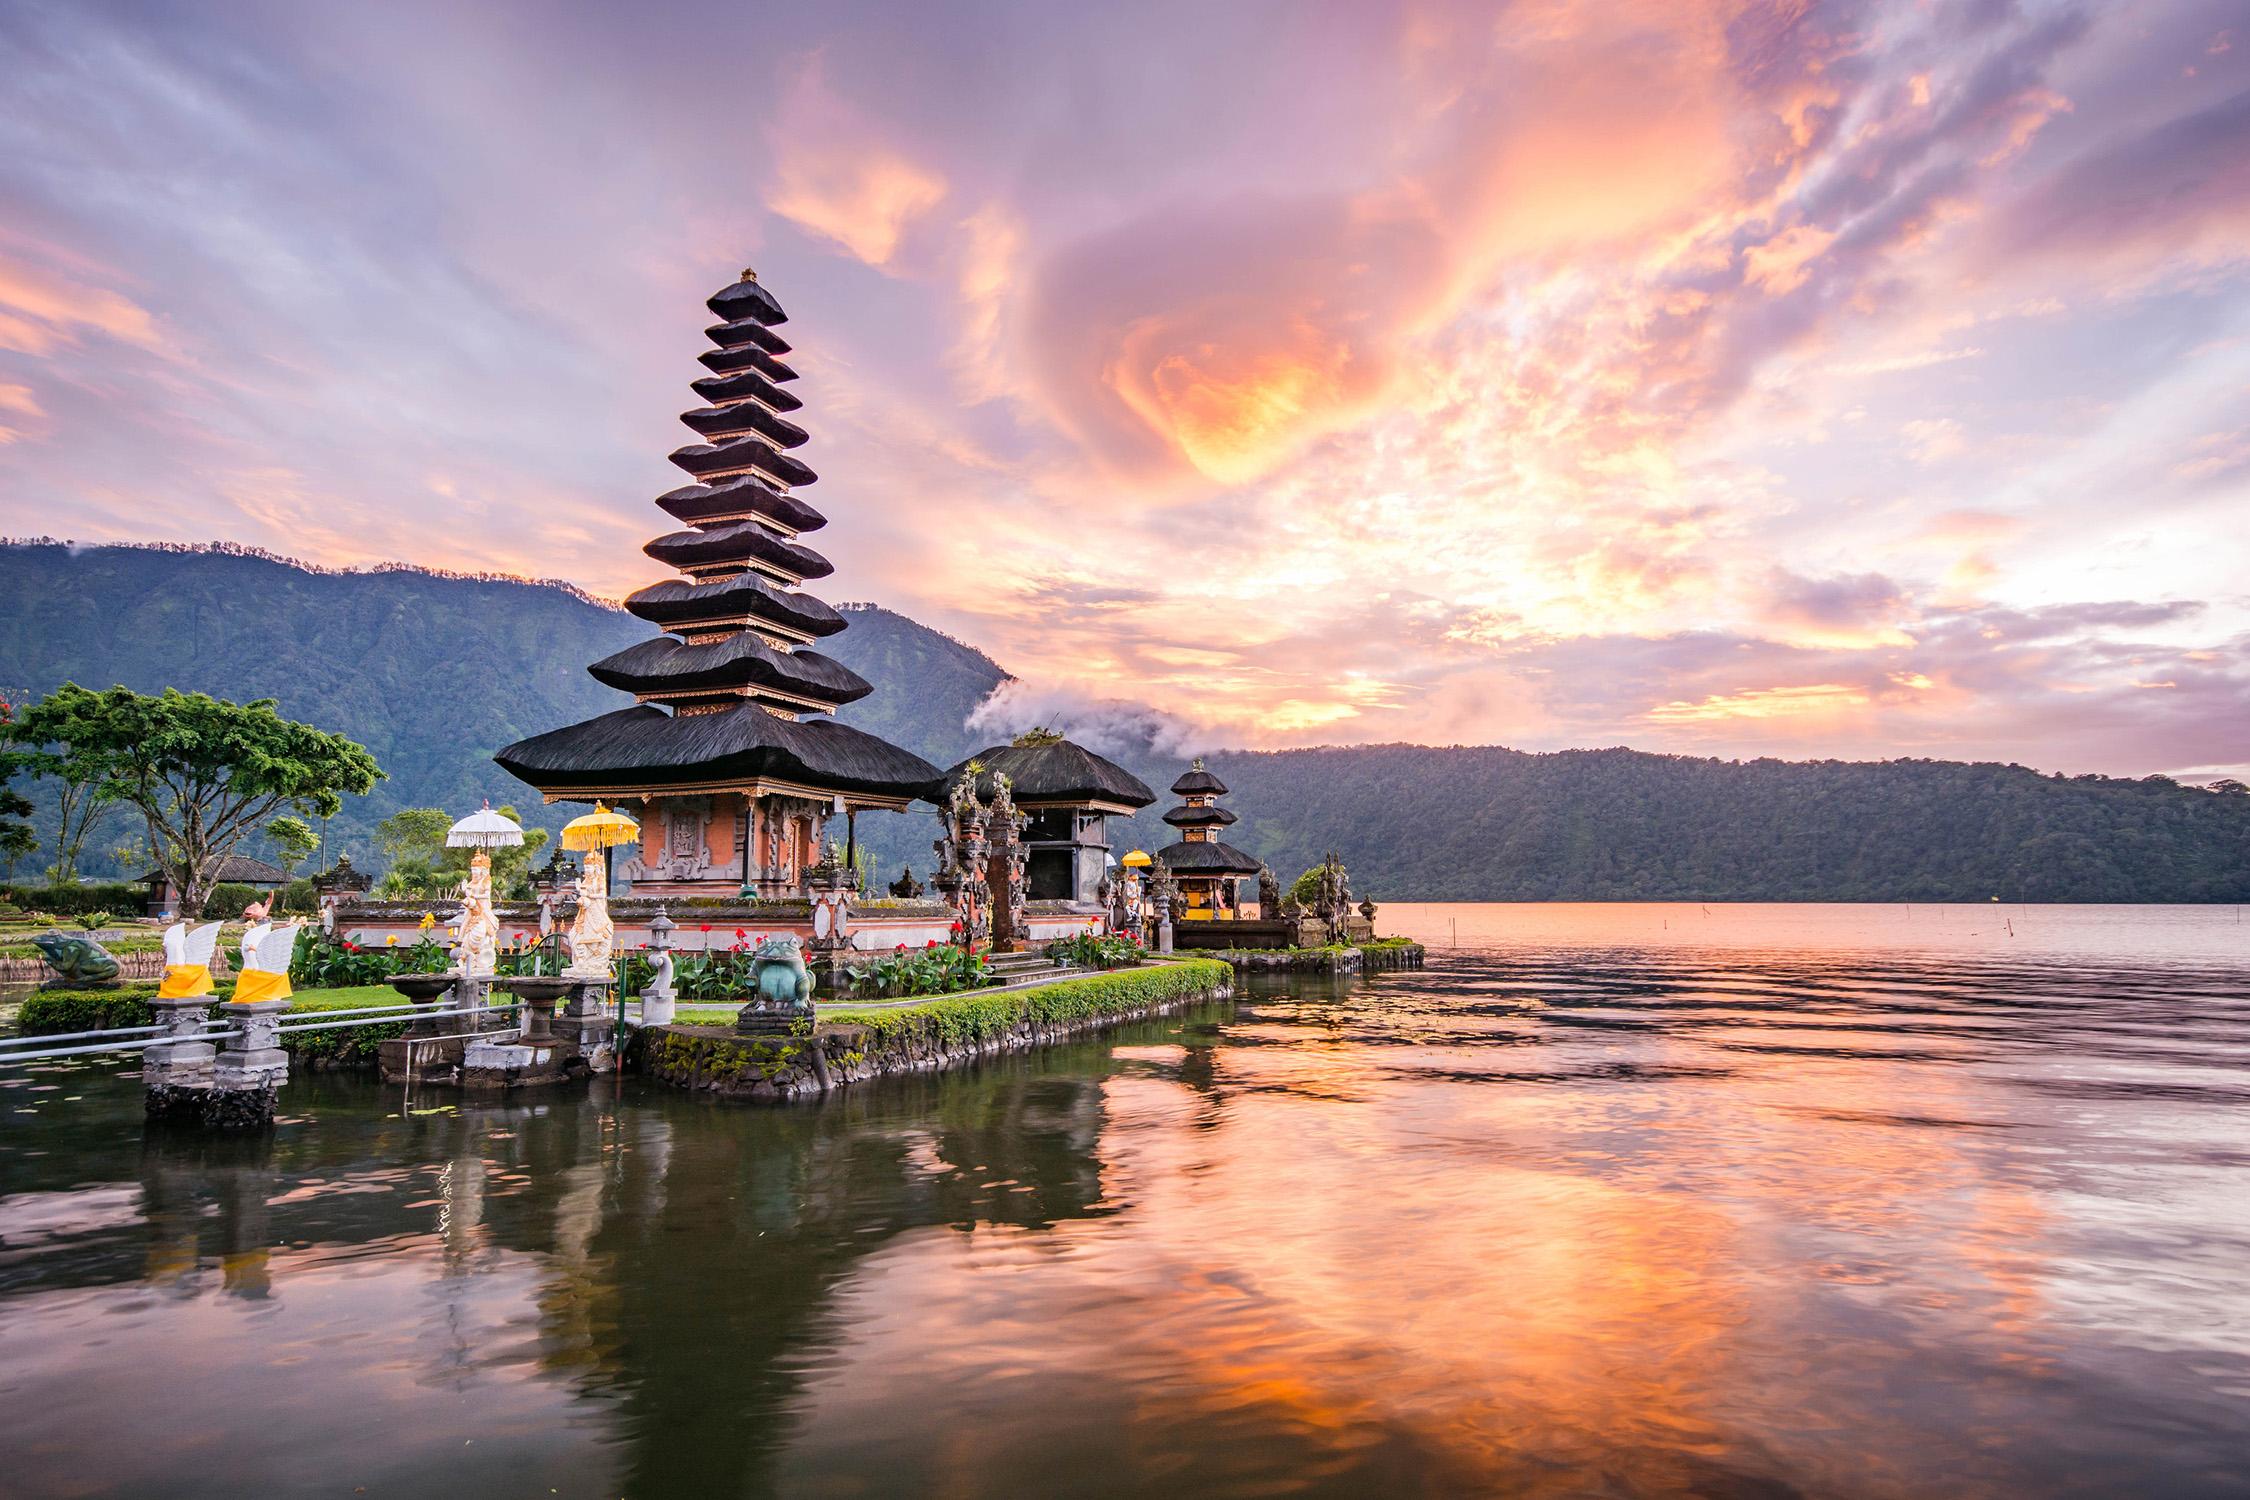 Bali Tempel Sonnenuntergang Error Fare Tage Im Top Cinci Luxus Hotel Auf Nur